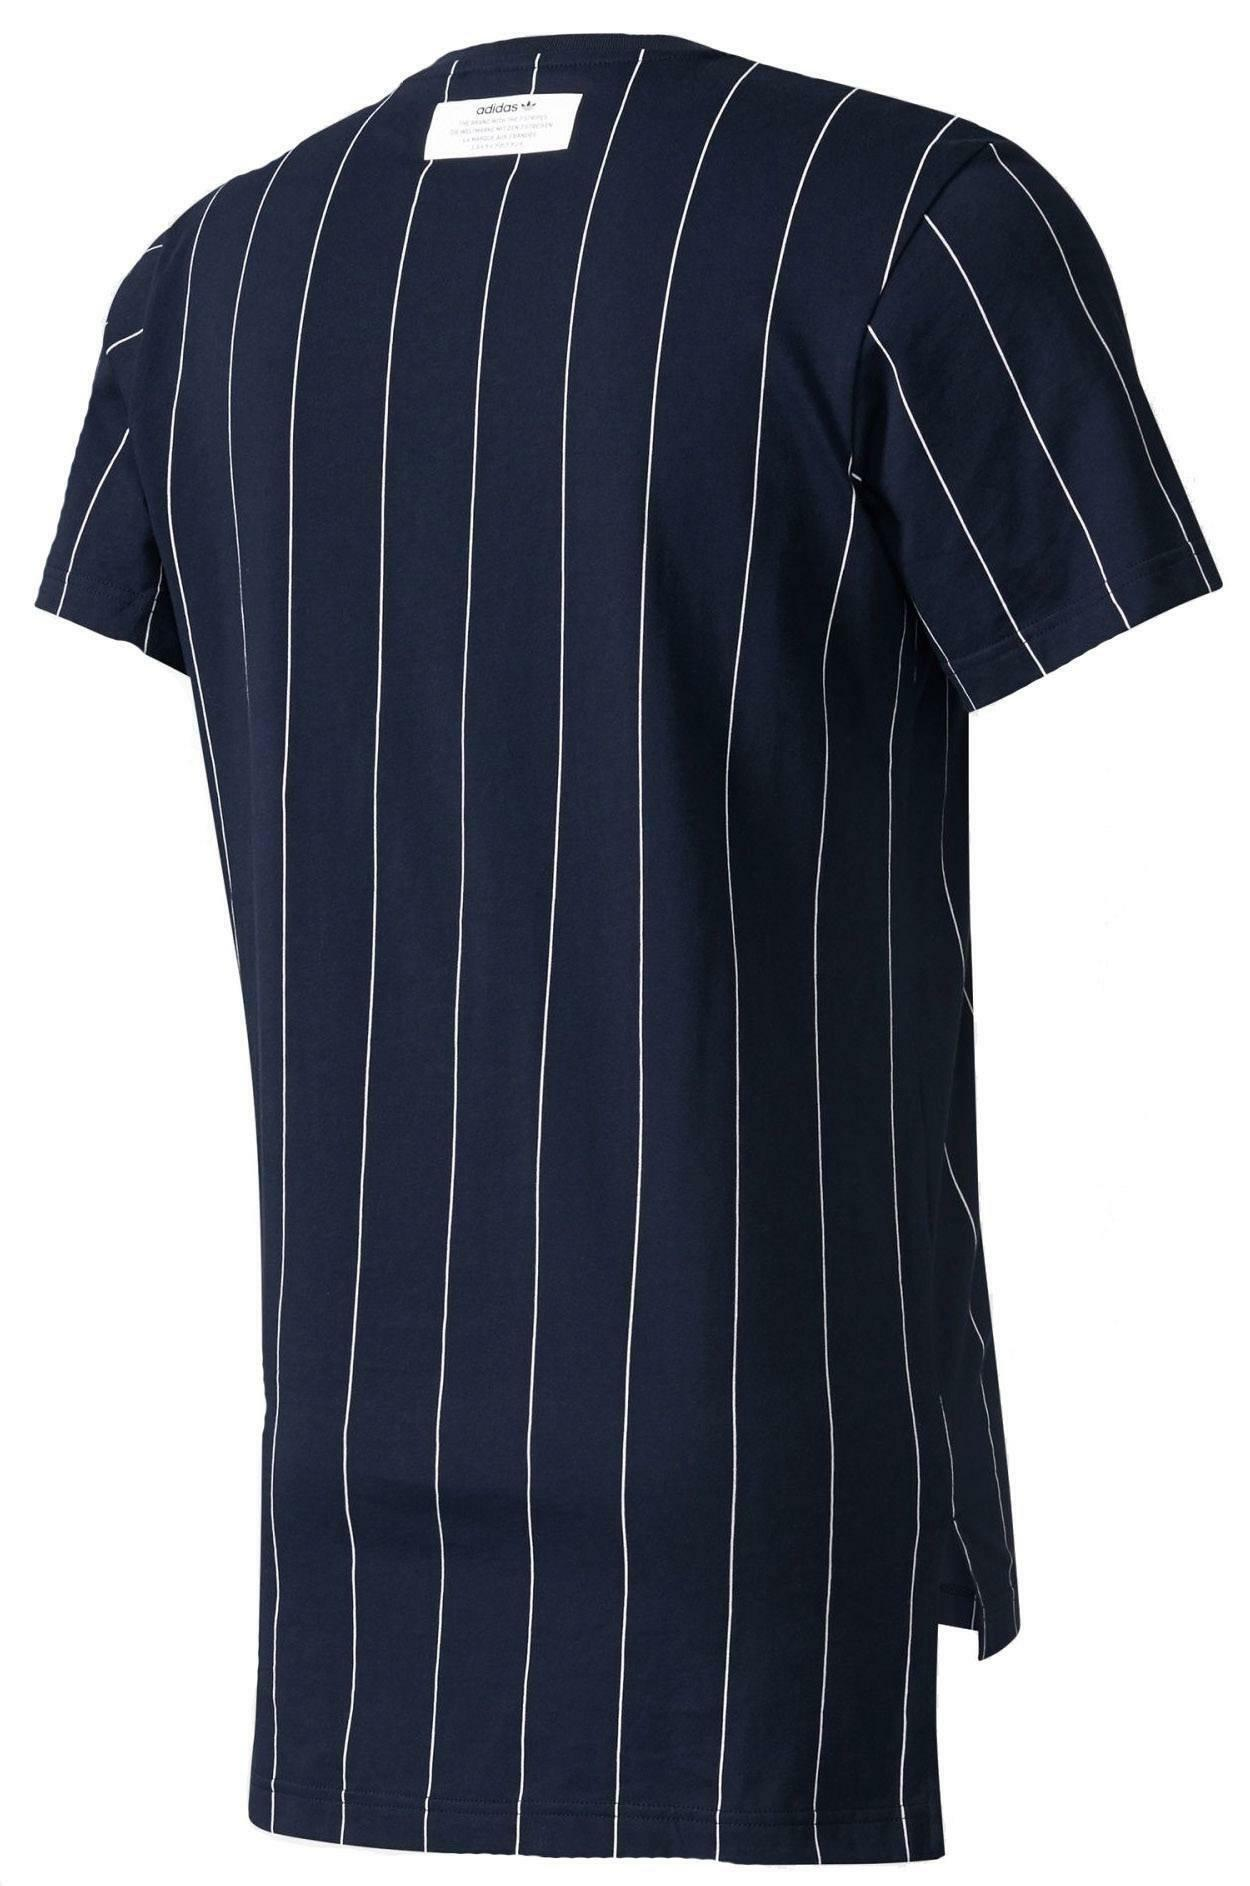 adidas adidas tko ps tee t-shirt uomo blu